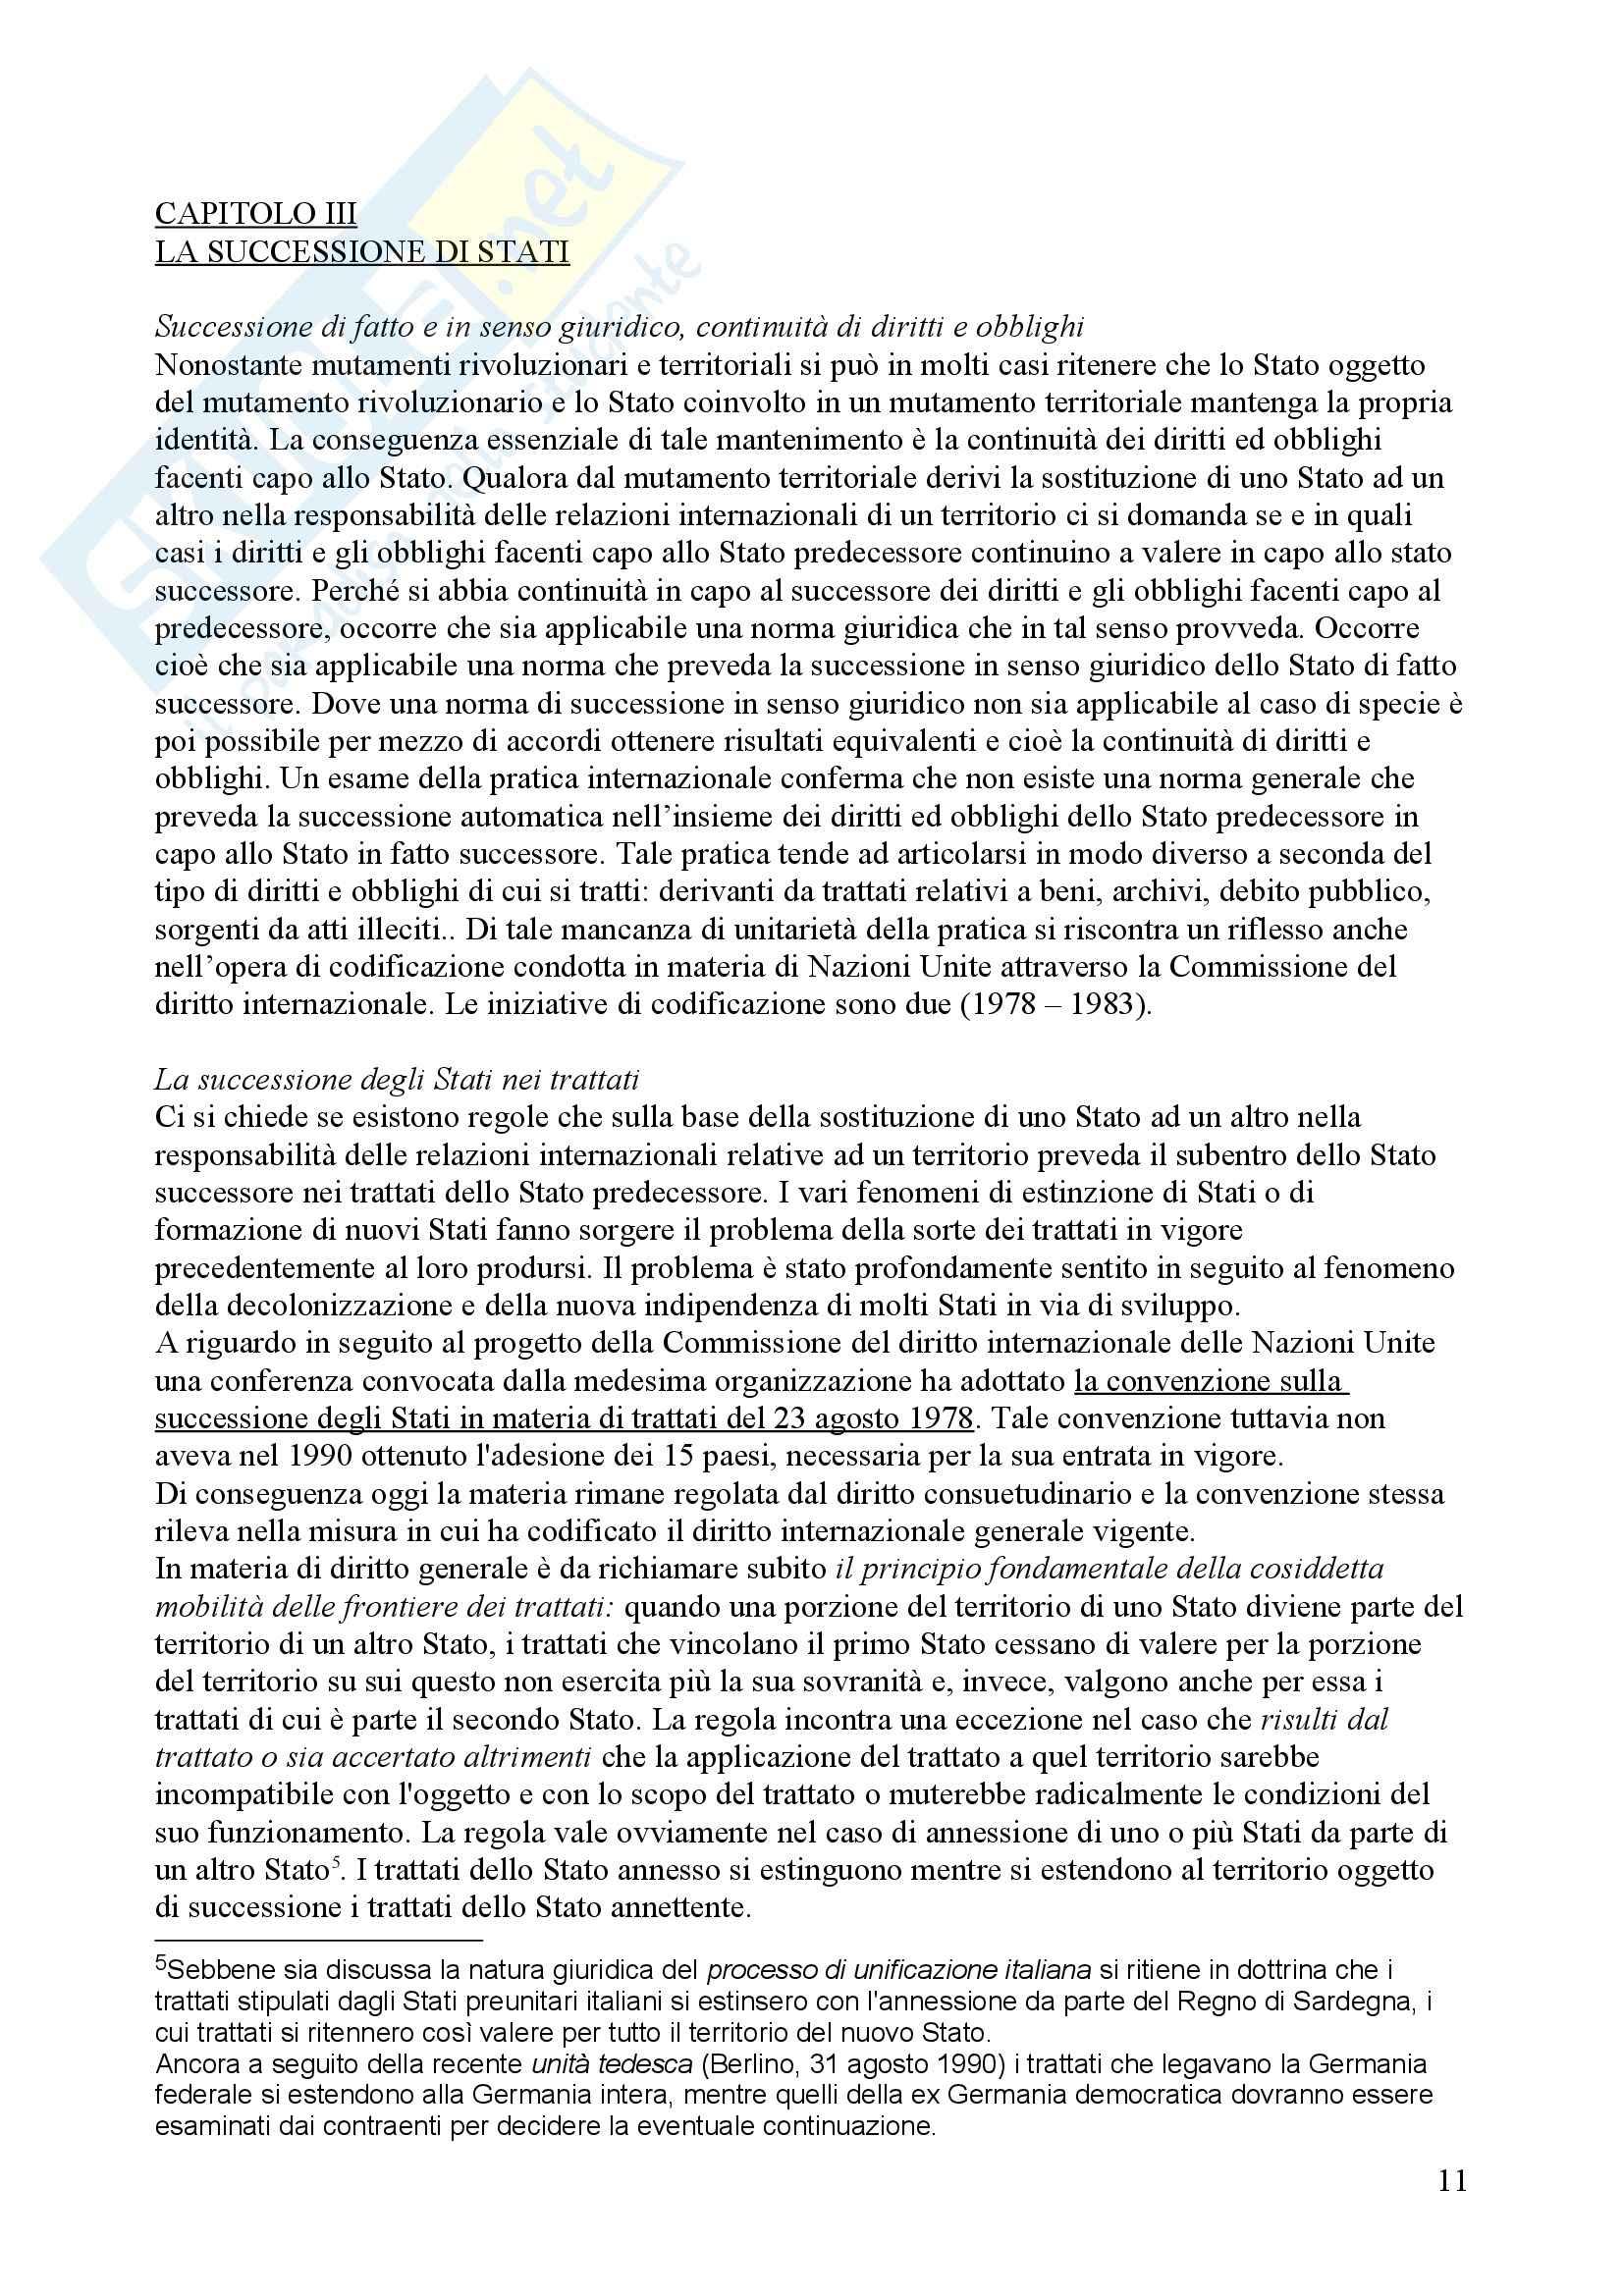 Riassunto esame Diritto internazionale, prof. Treves Pag. 11